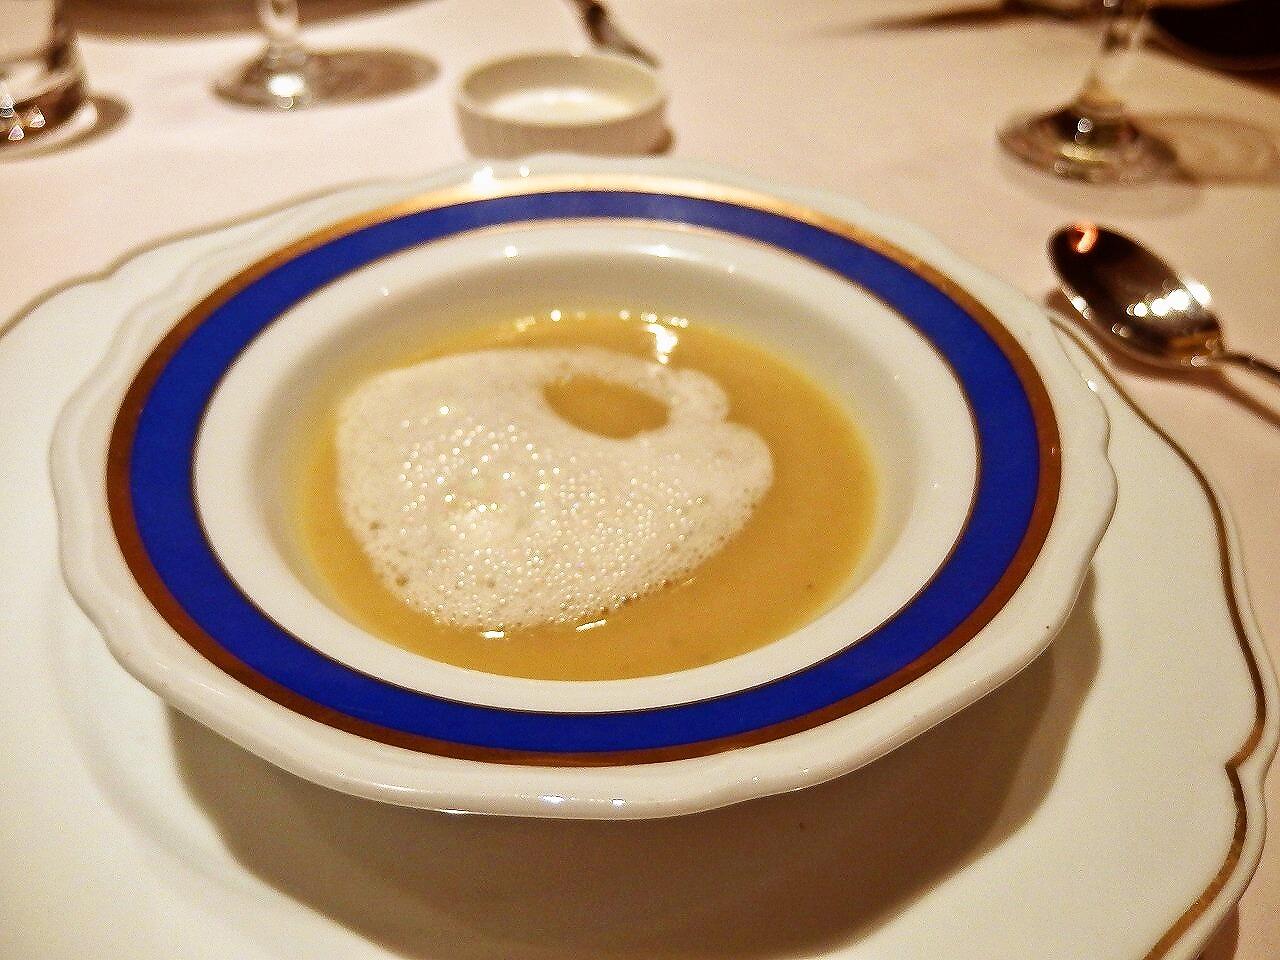 s-foodpic6551463.jpg